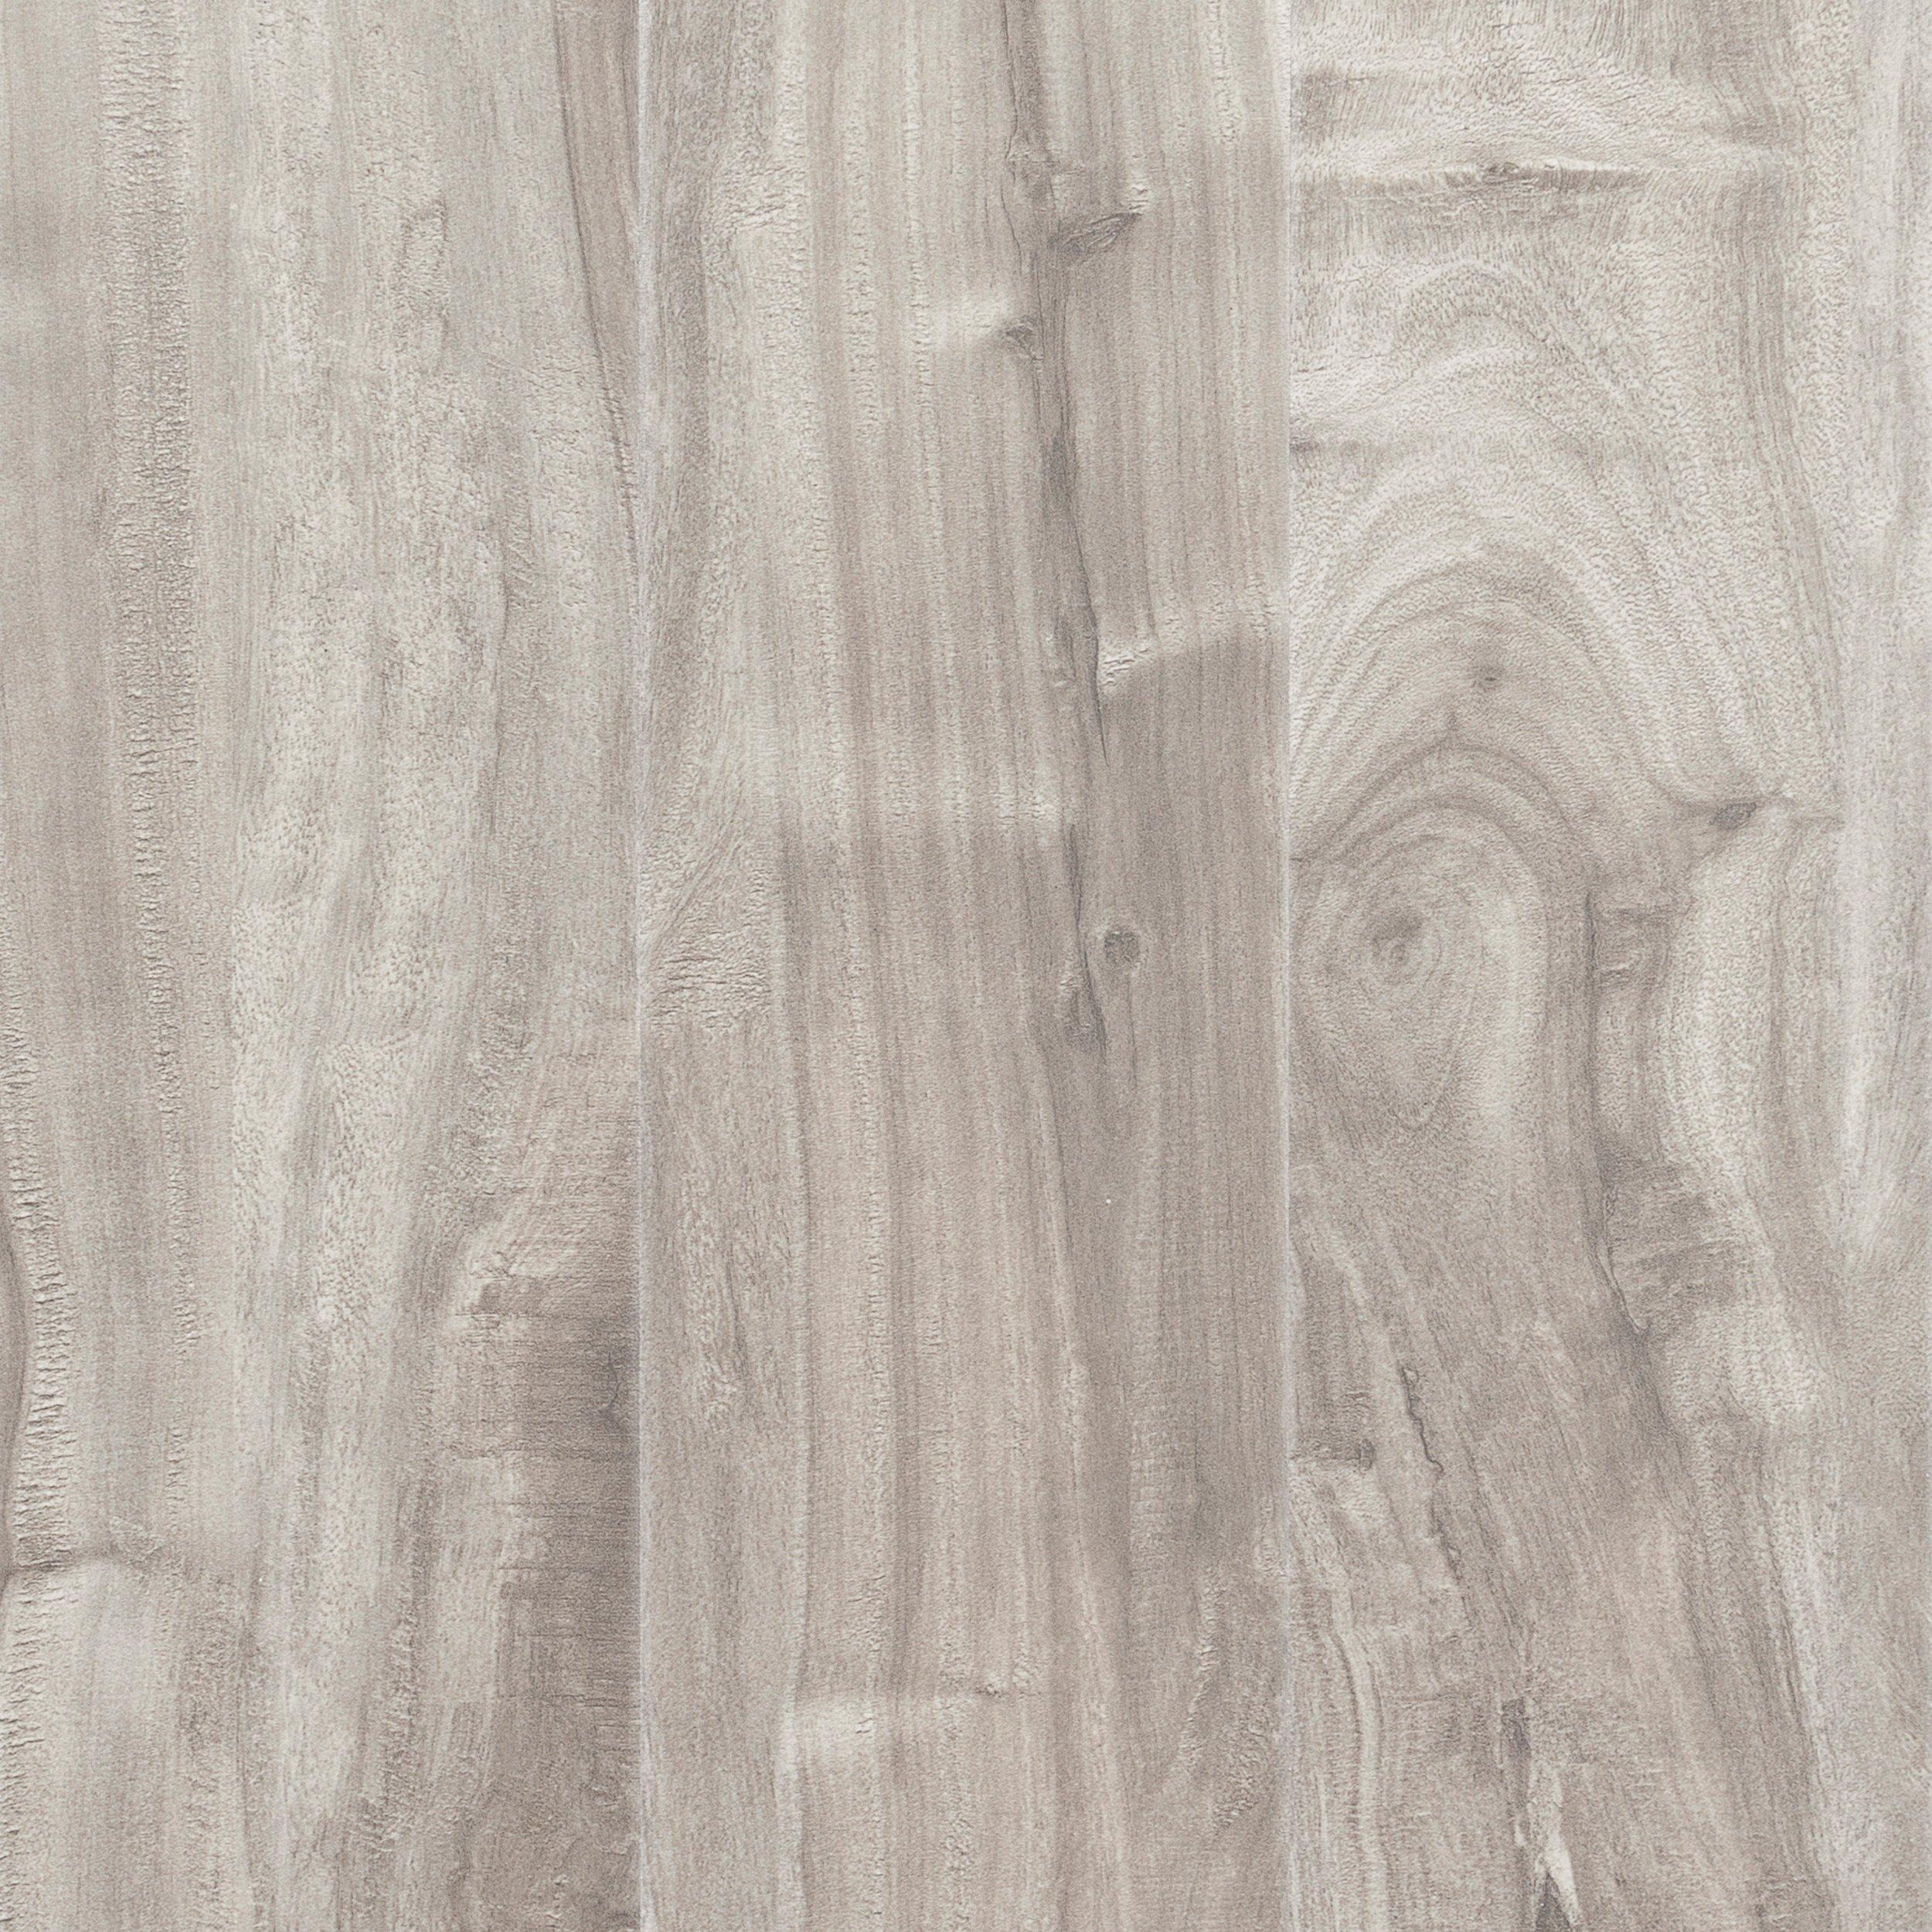 Hampstead Silver Maple Beveled Laminate 12mm 100130236 Floor